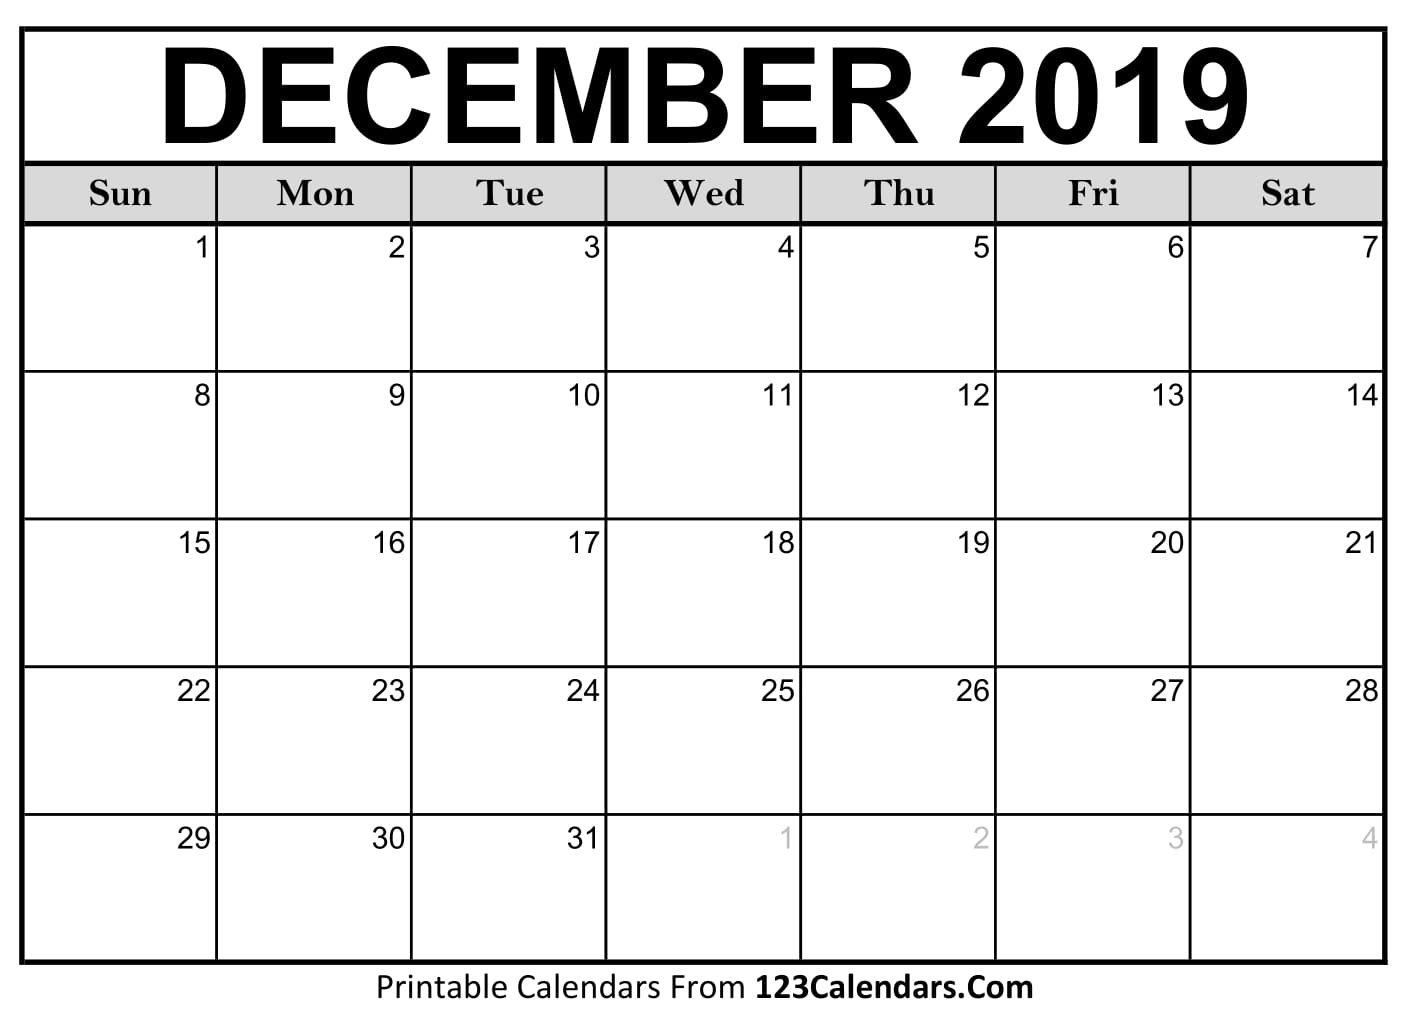 December 2019 Printable Calendar | 123Calendars Calendar 2019 December Printable